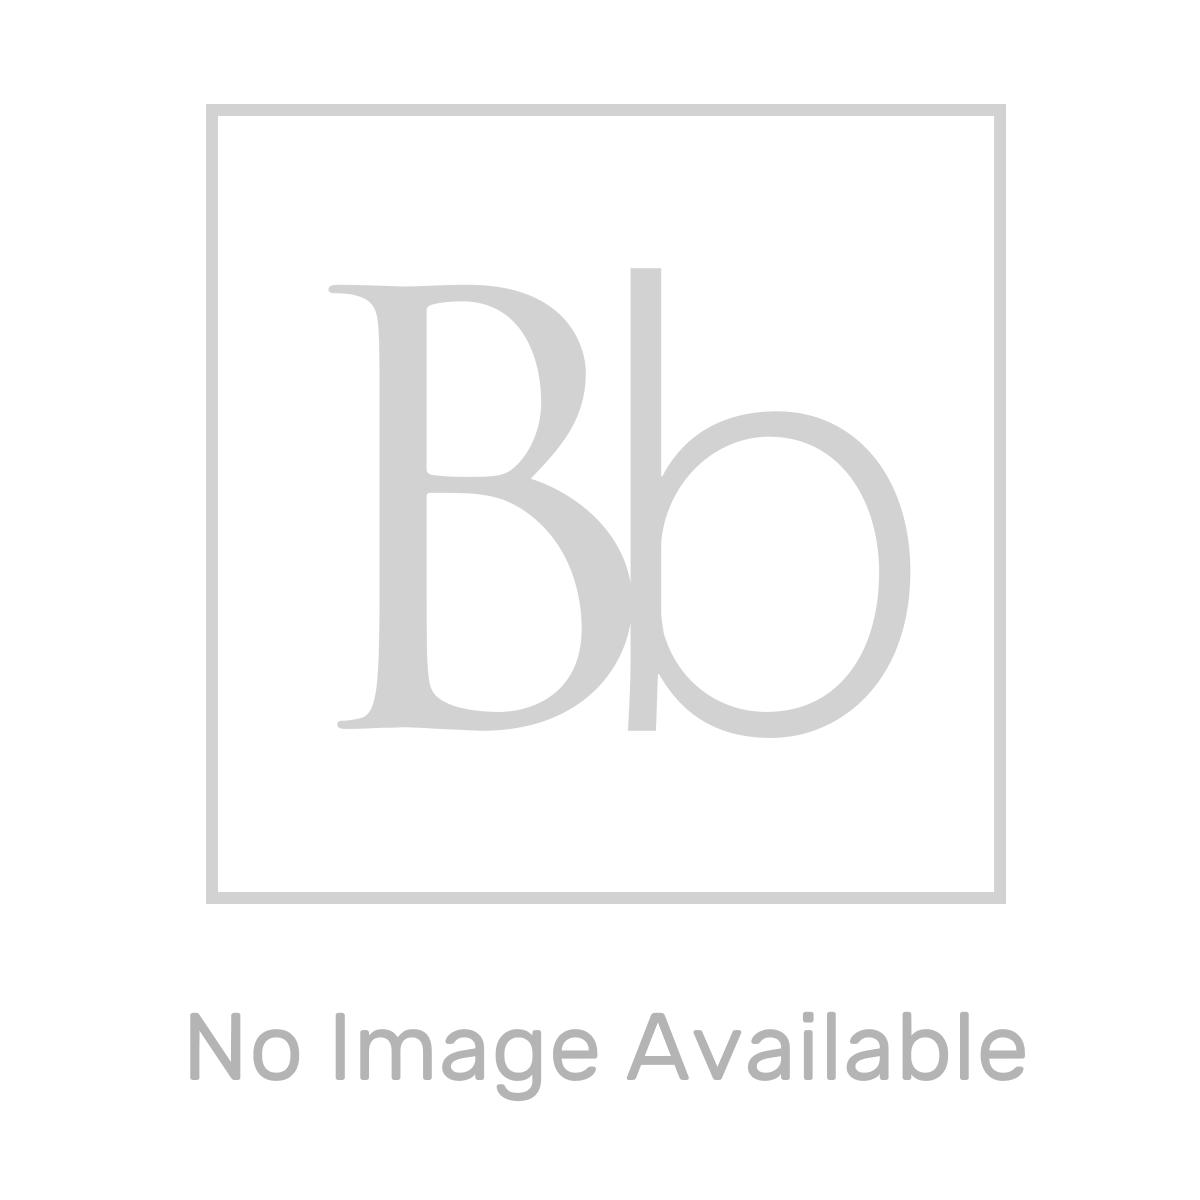 BTL White Laurus² Back To Wall Toilet Line Drawing